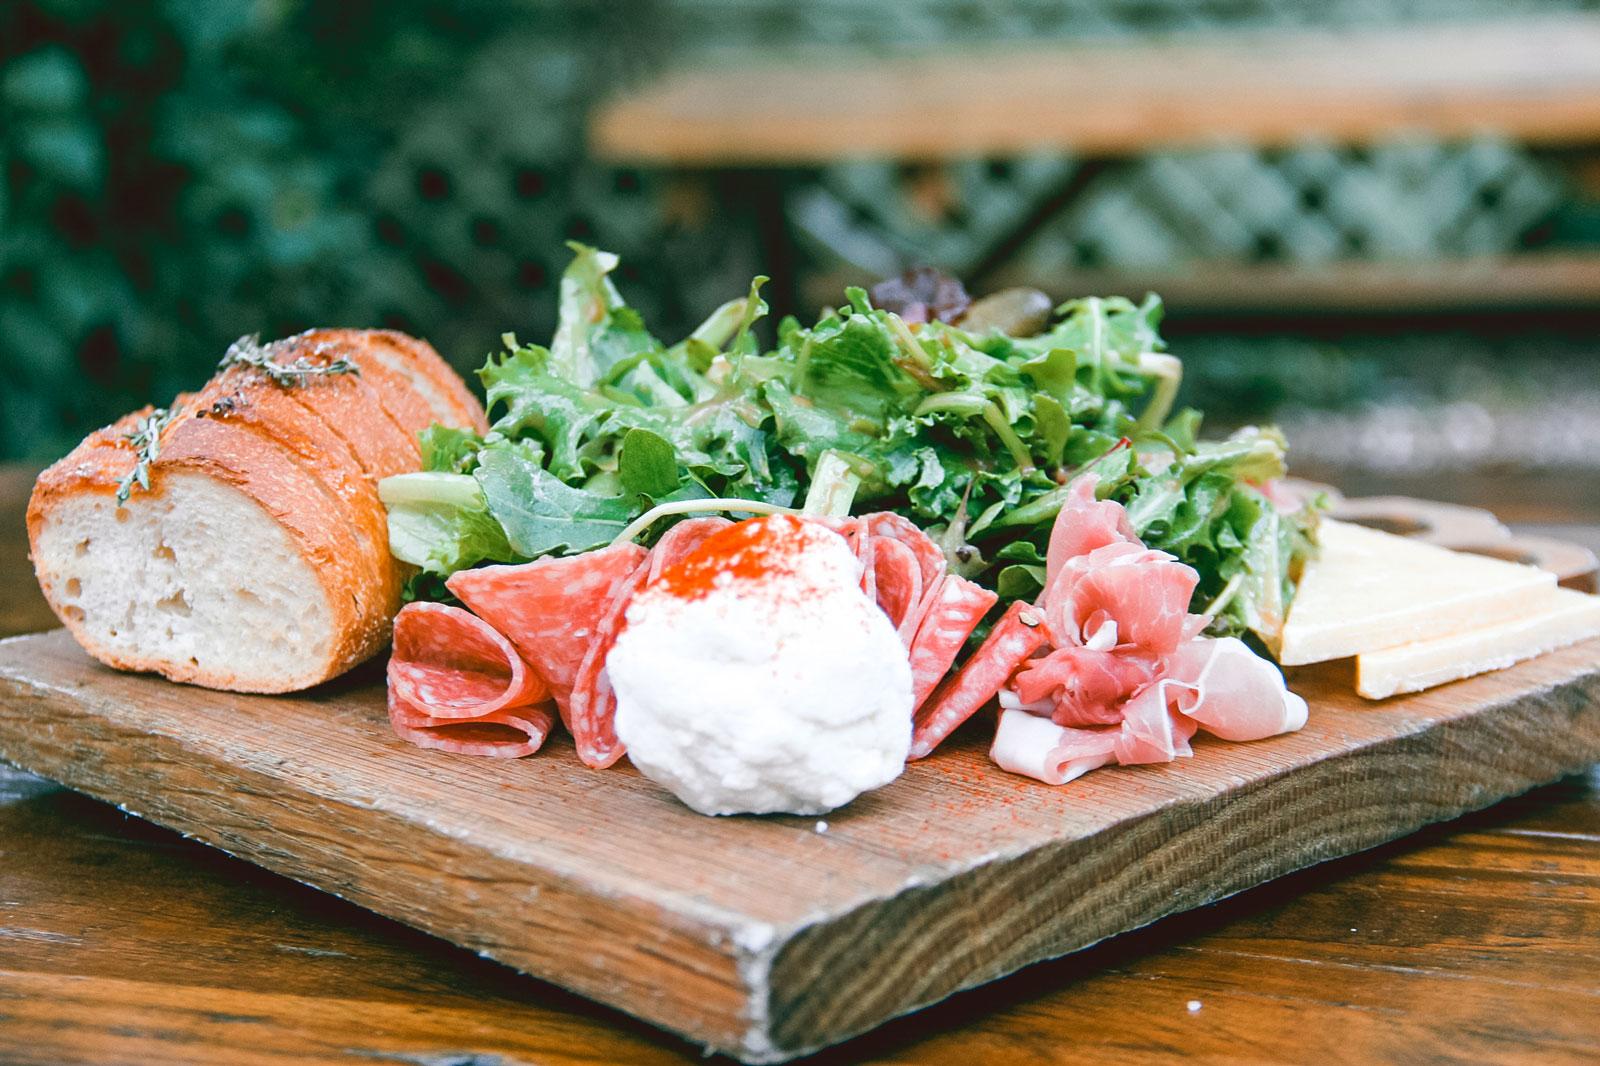 Close-up of salami and cheese board.